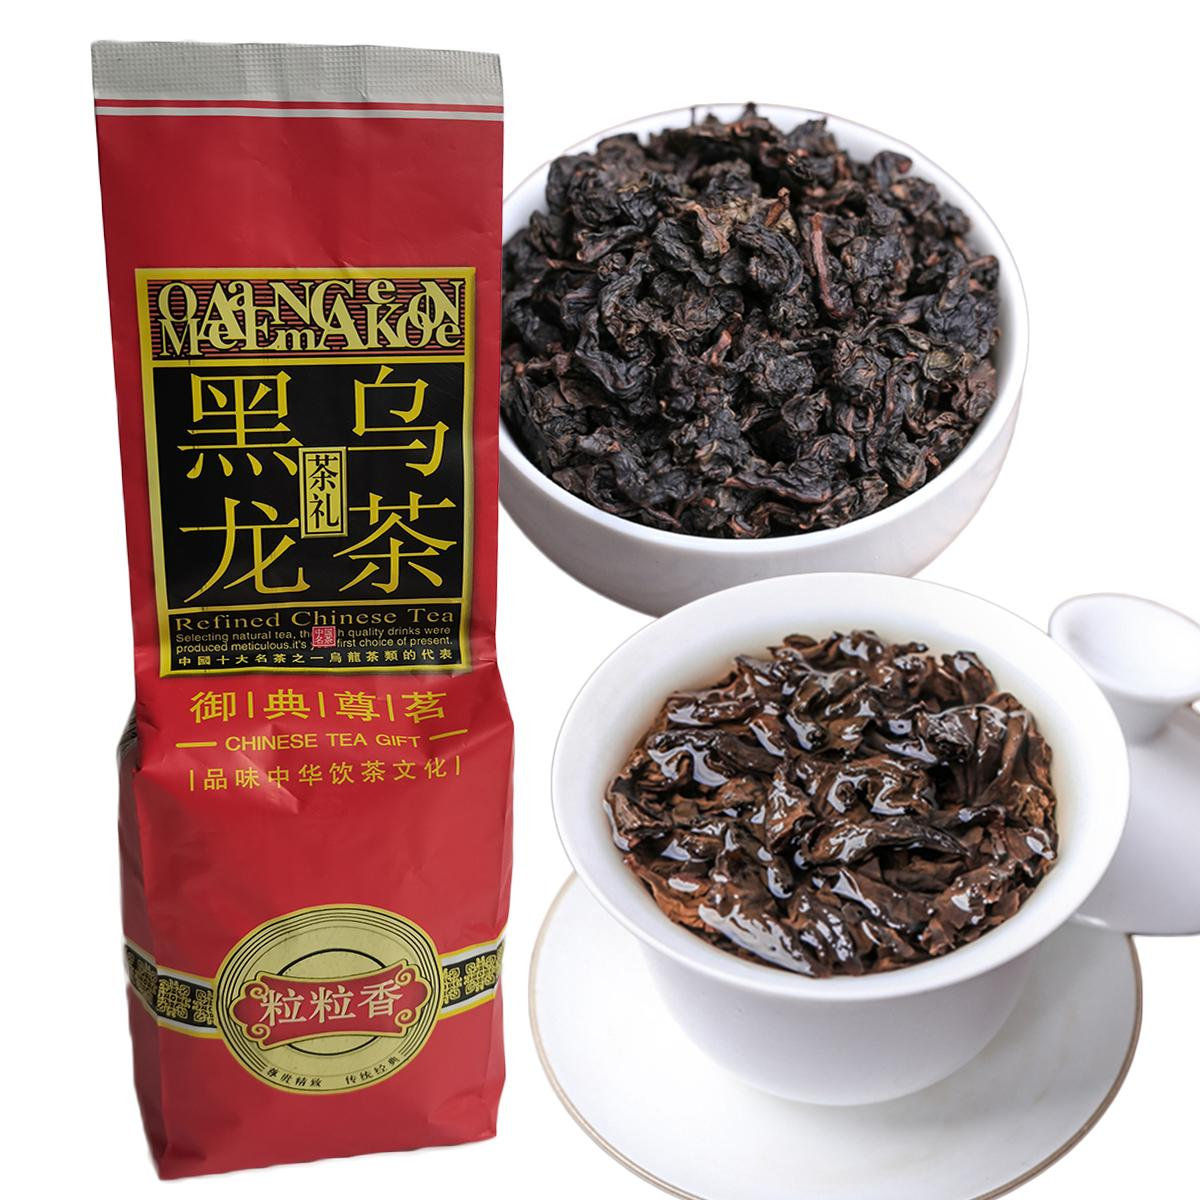 250g Öne Çıkan Siyah Oolong Çay Çin Yeni Bahar Oolong Siyah Çay Organik Tieguanyin Tikuanyin Yeşil Gıda Kırmızı Çay Sıcak Satış